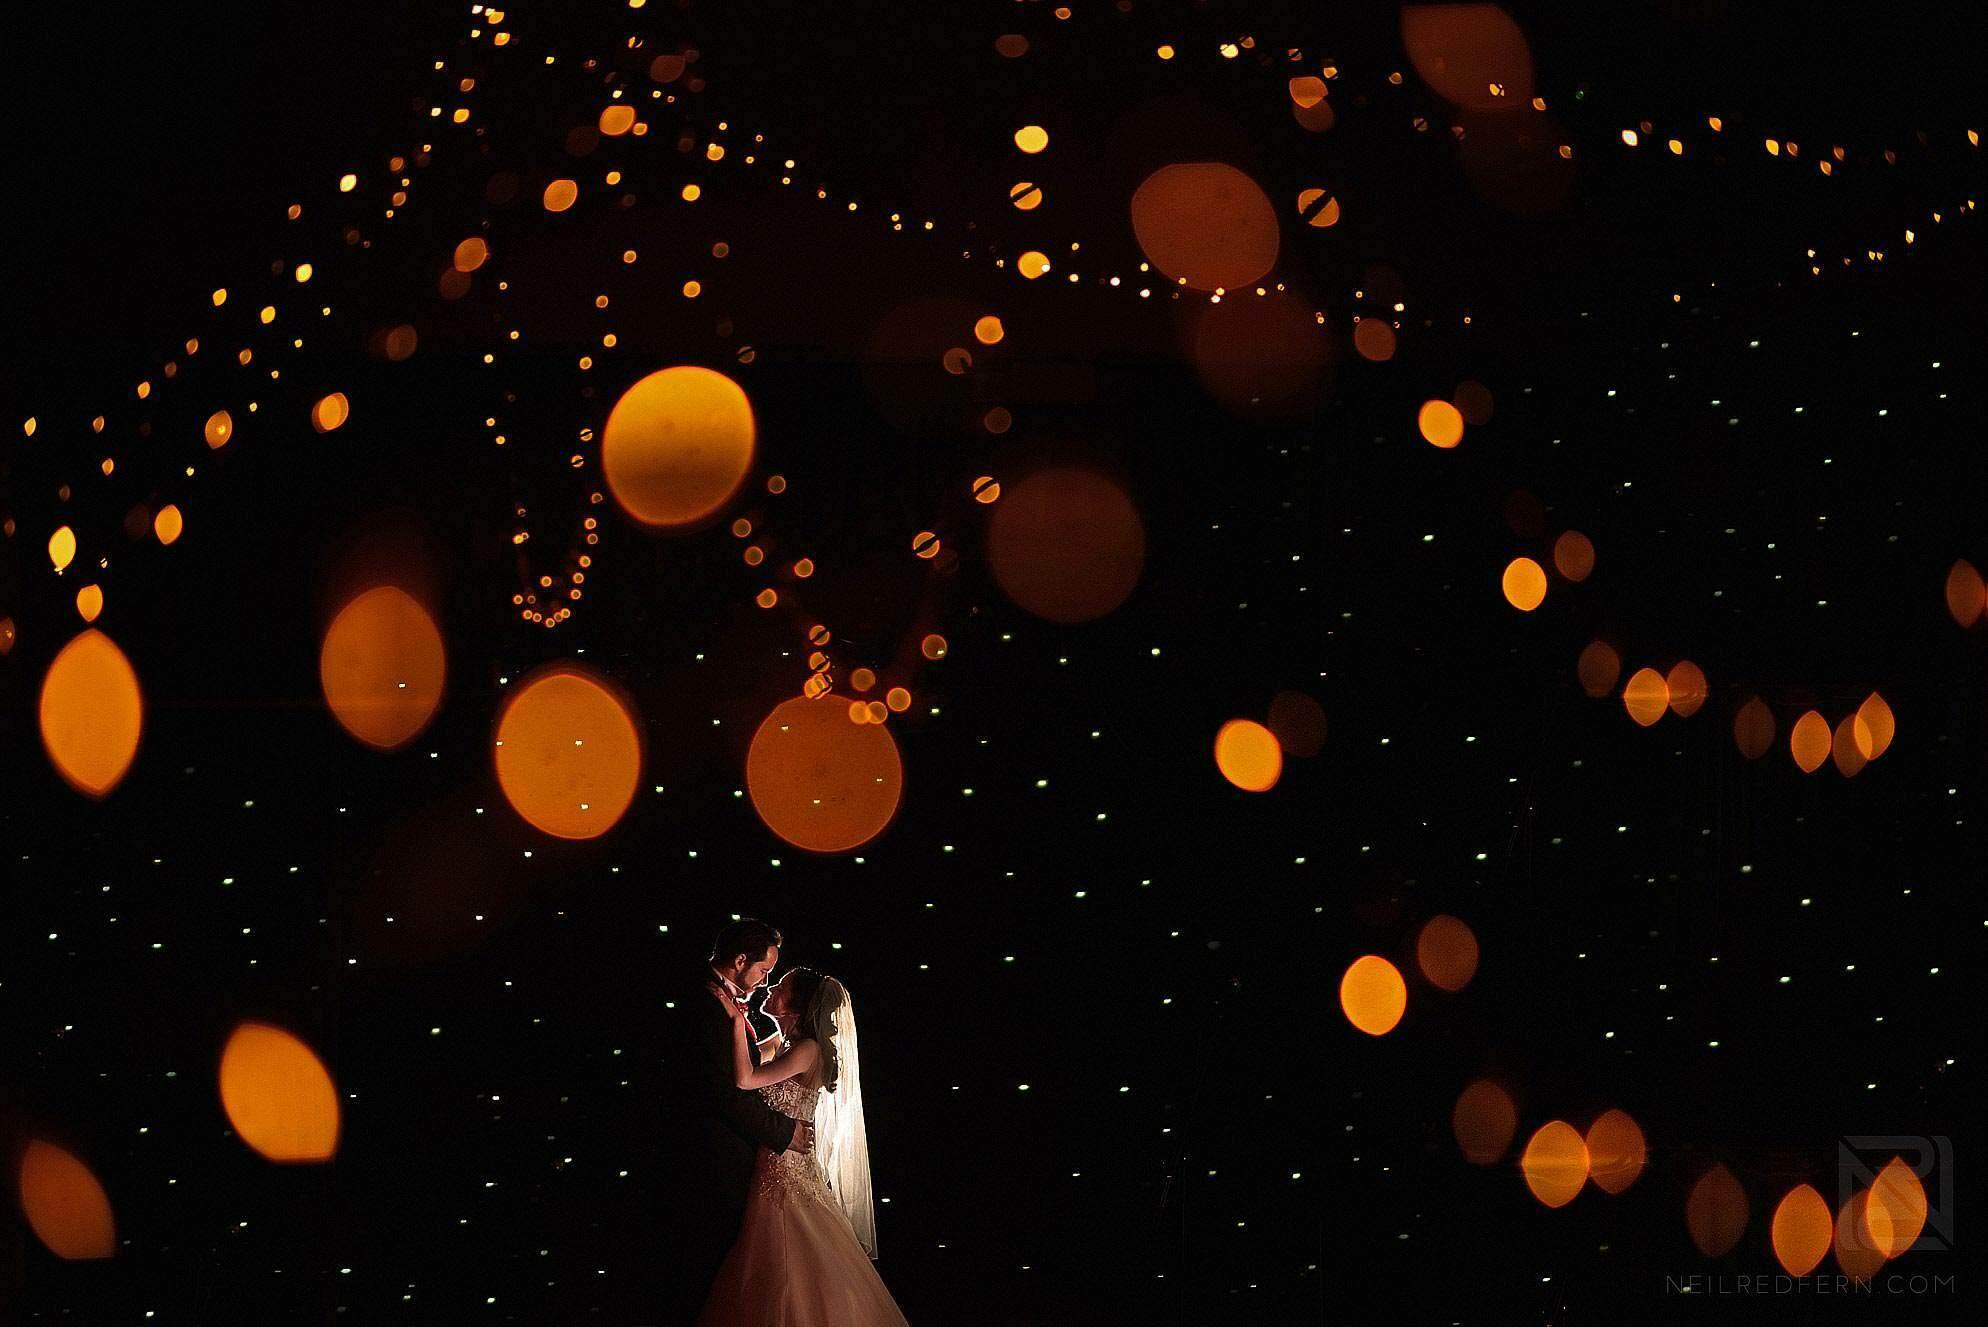 best-wedding-photography-2016-037